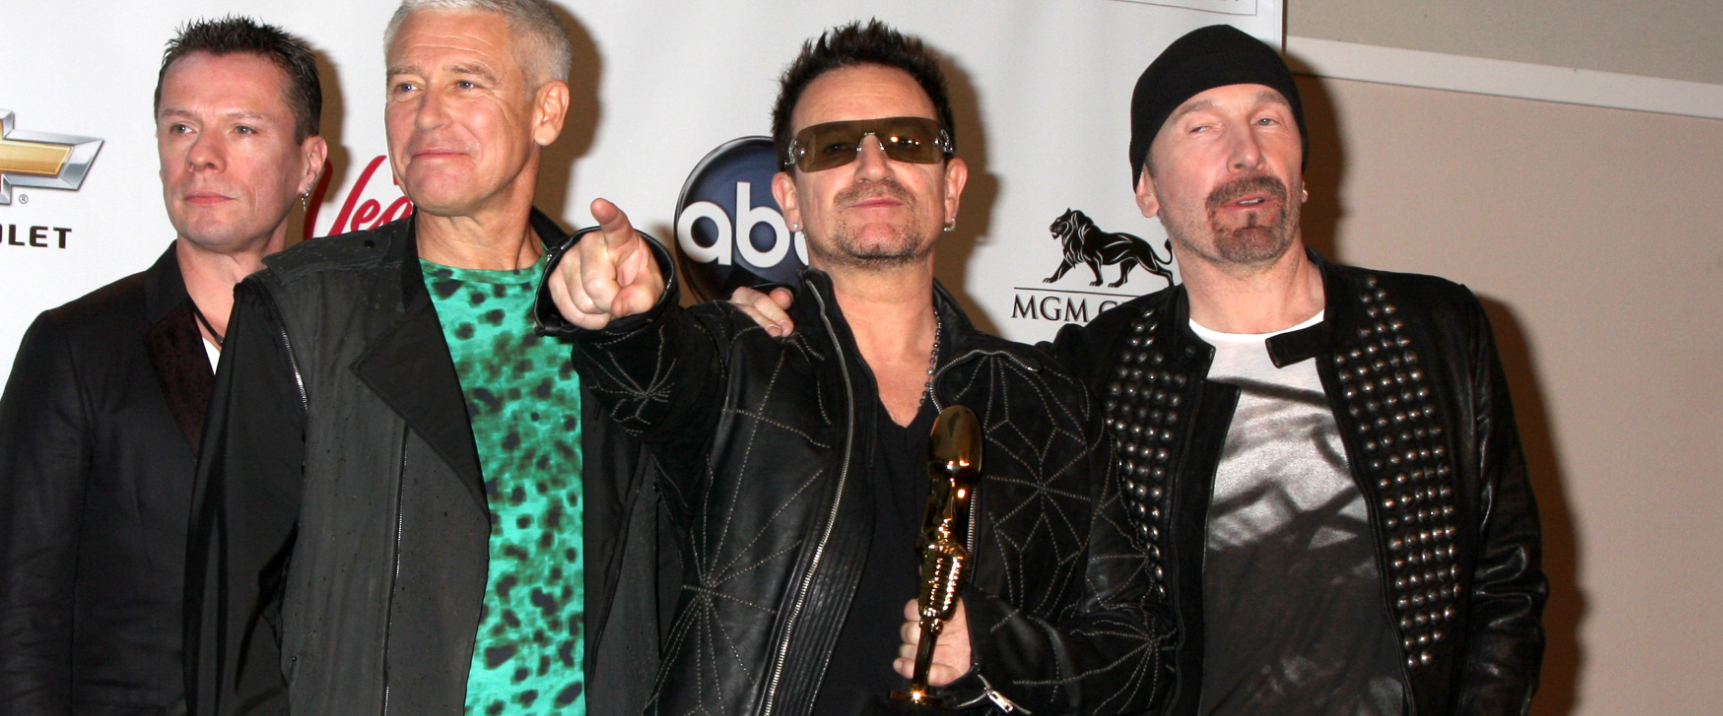 Bono promotes capitalism